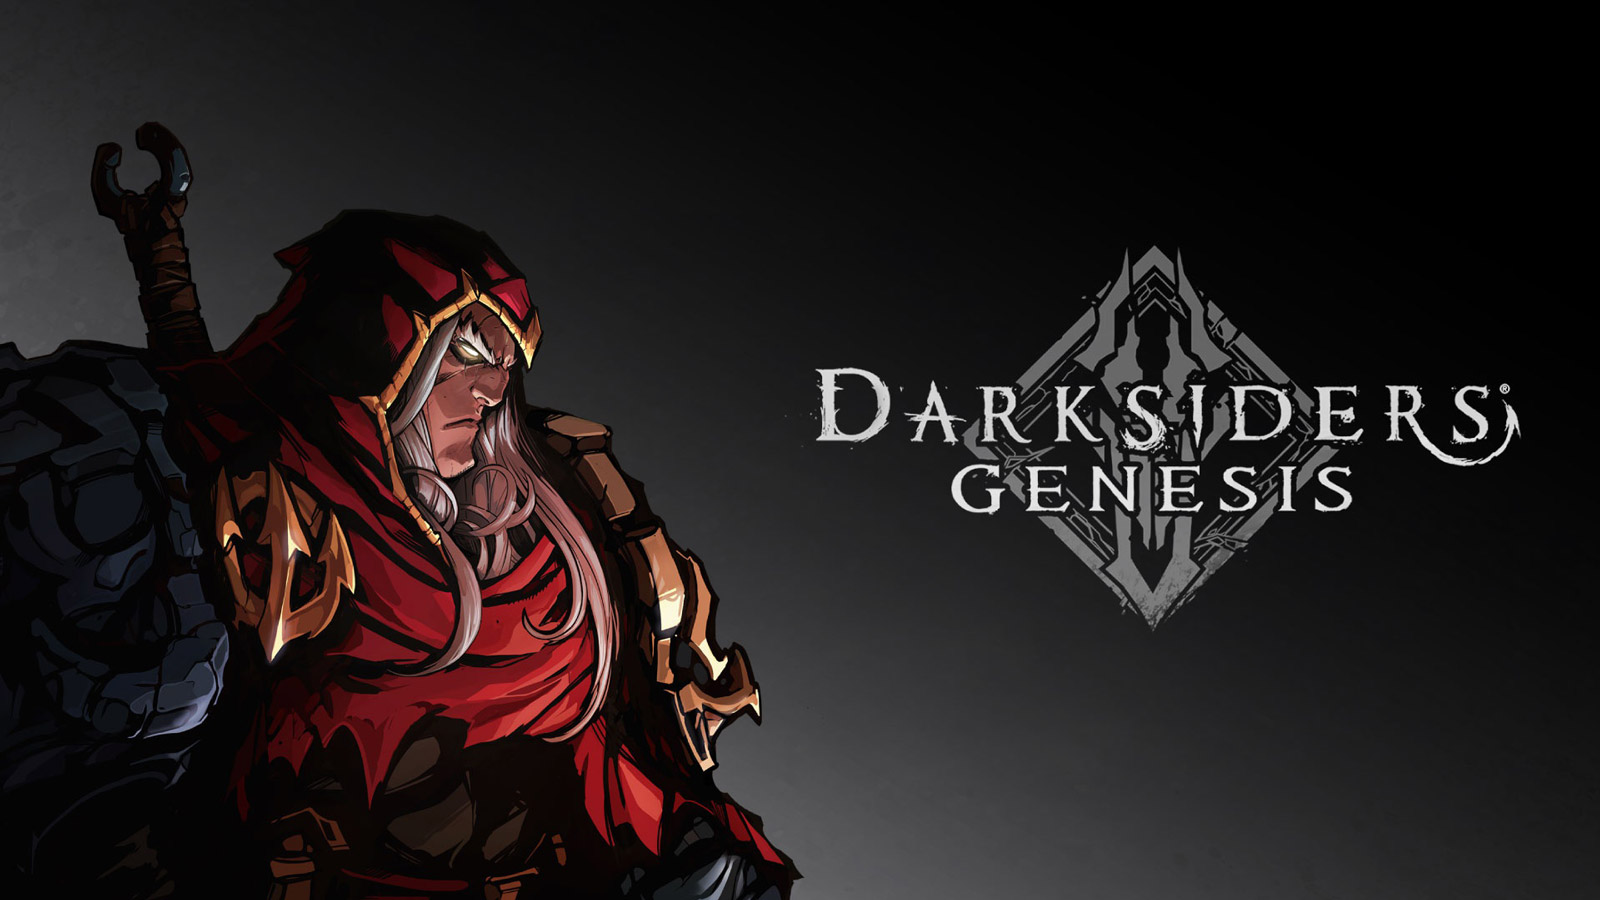 Darksiders Genesis Wallpaper in 1600x900